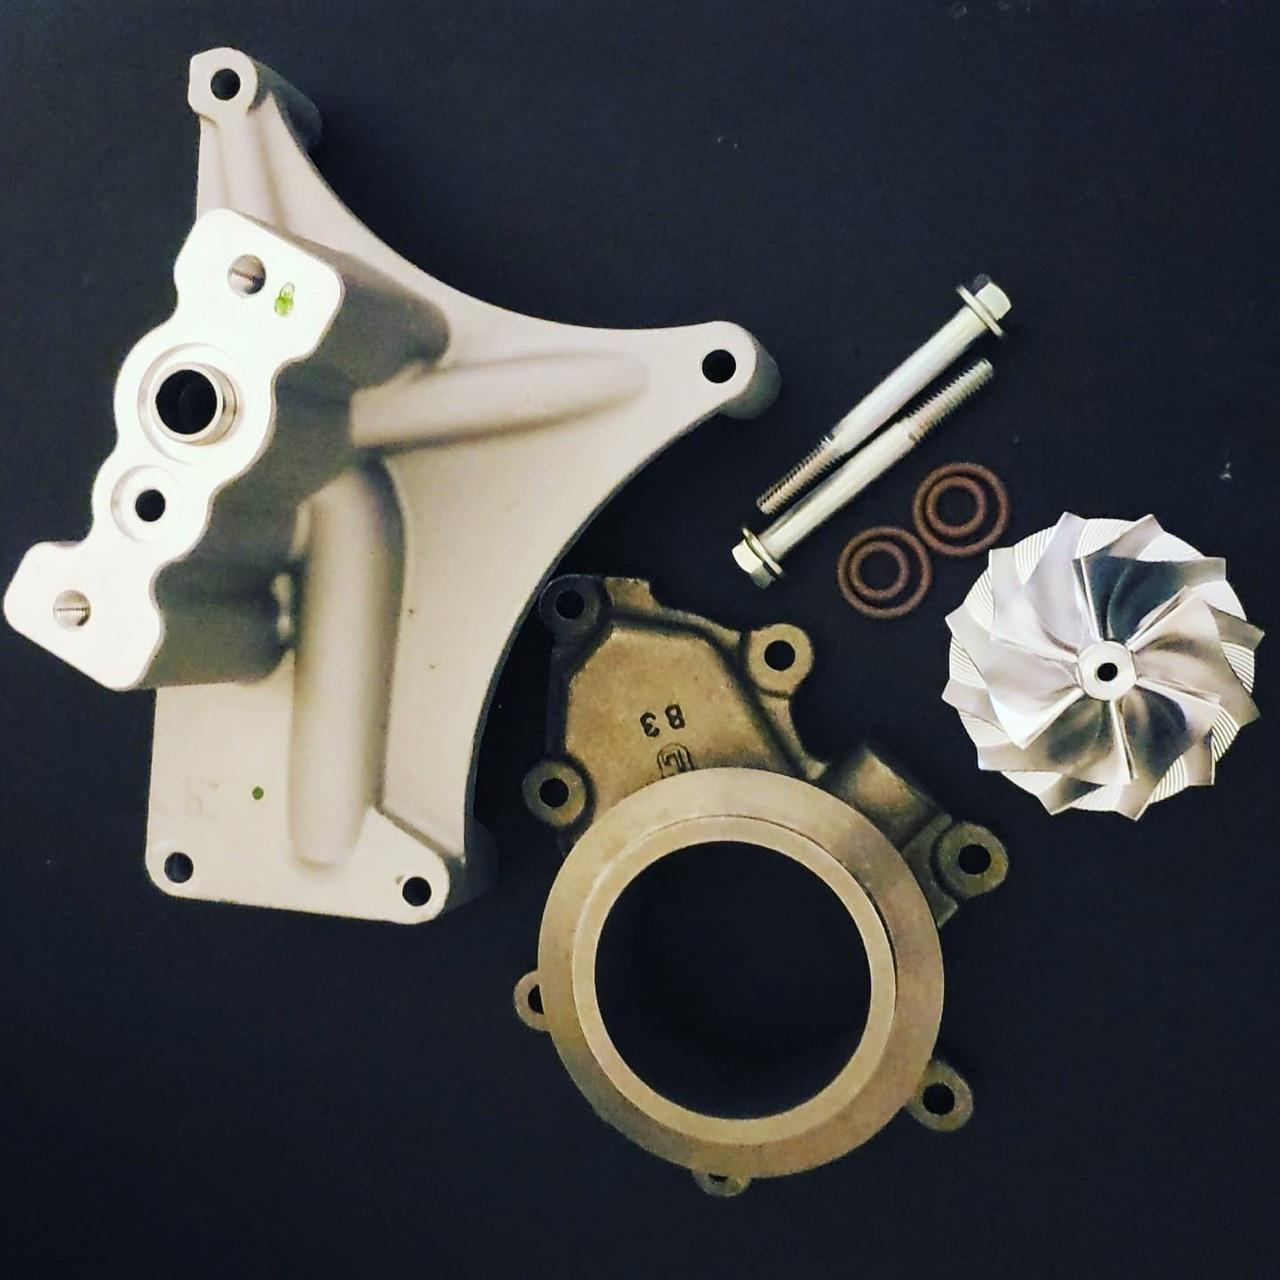 EBC Brakes S1KR1008 Disc Brake Pad and Rotor Kit